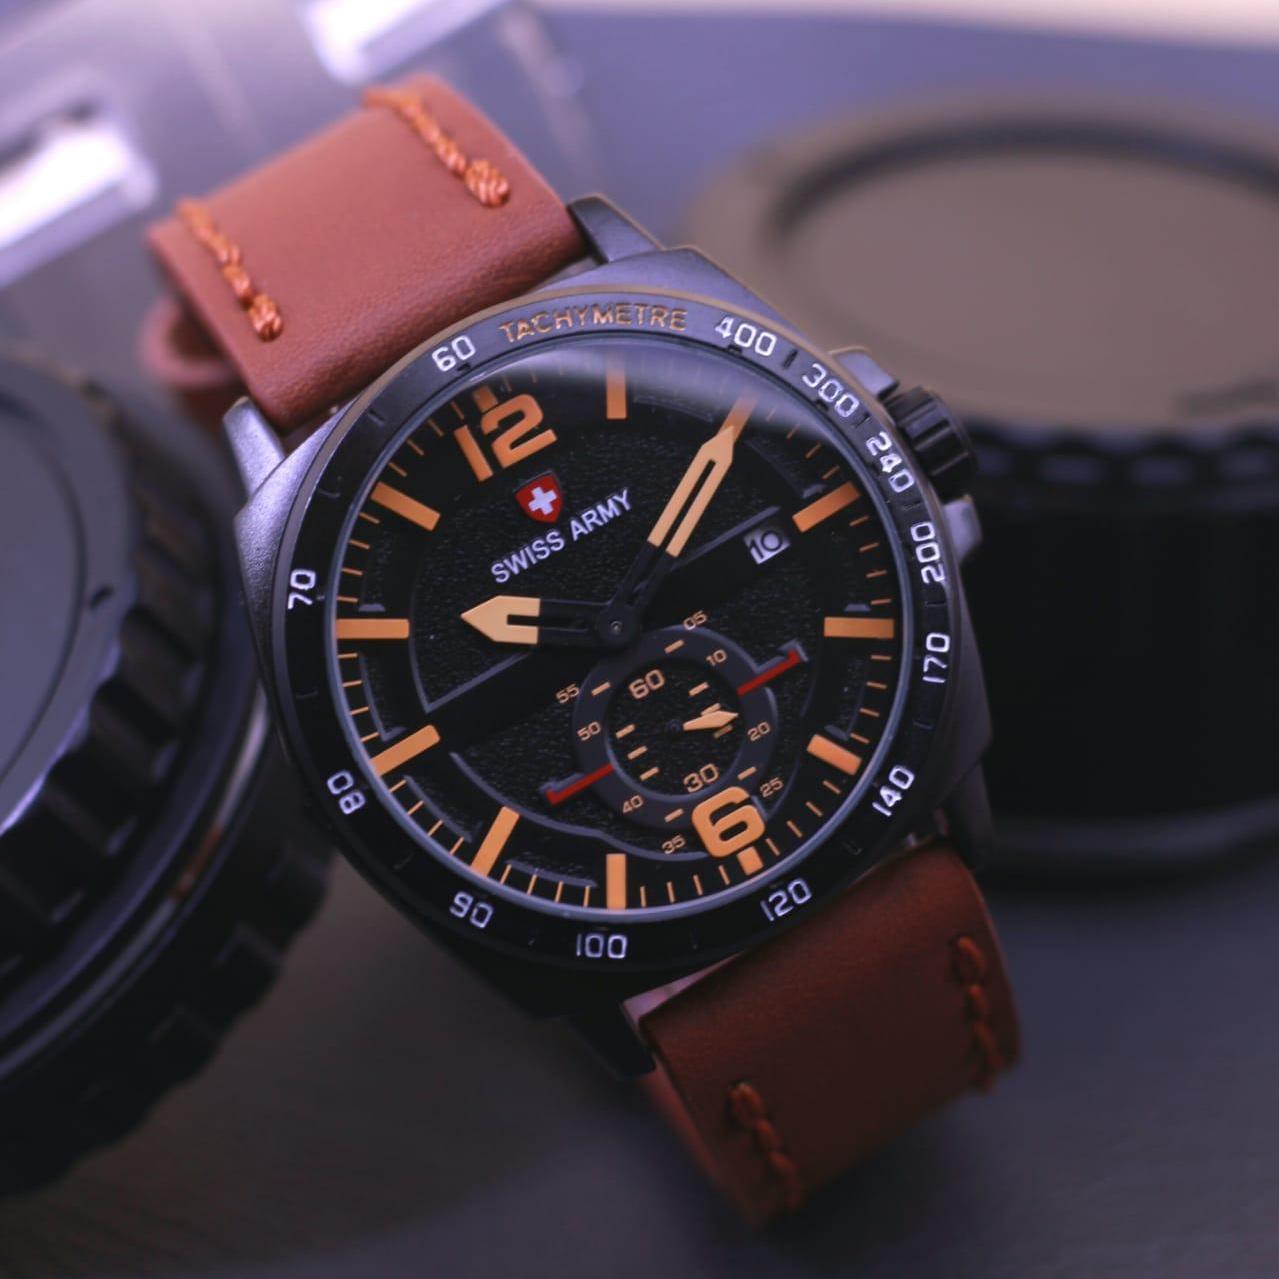 ... Leather Strap Daftar Source · swis army original jam tangan pria swiss army SA 7811 detik bawah aktif crono